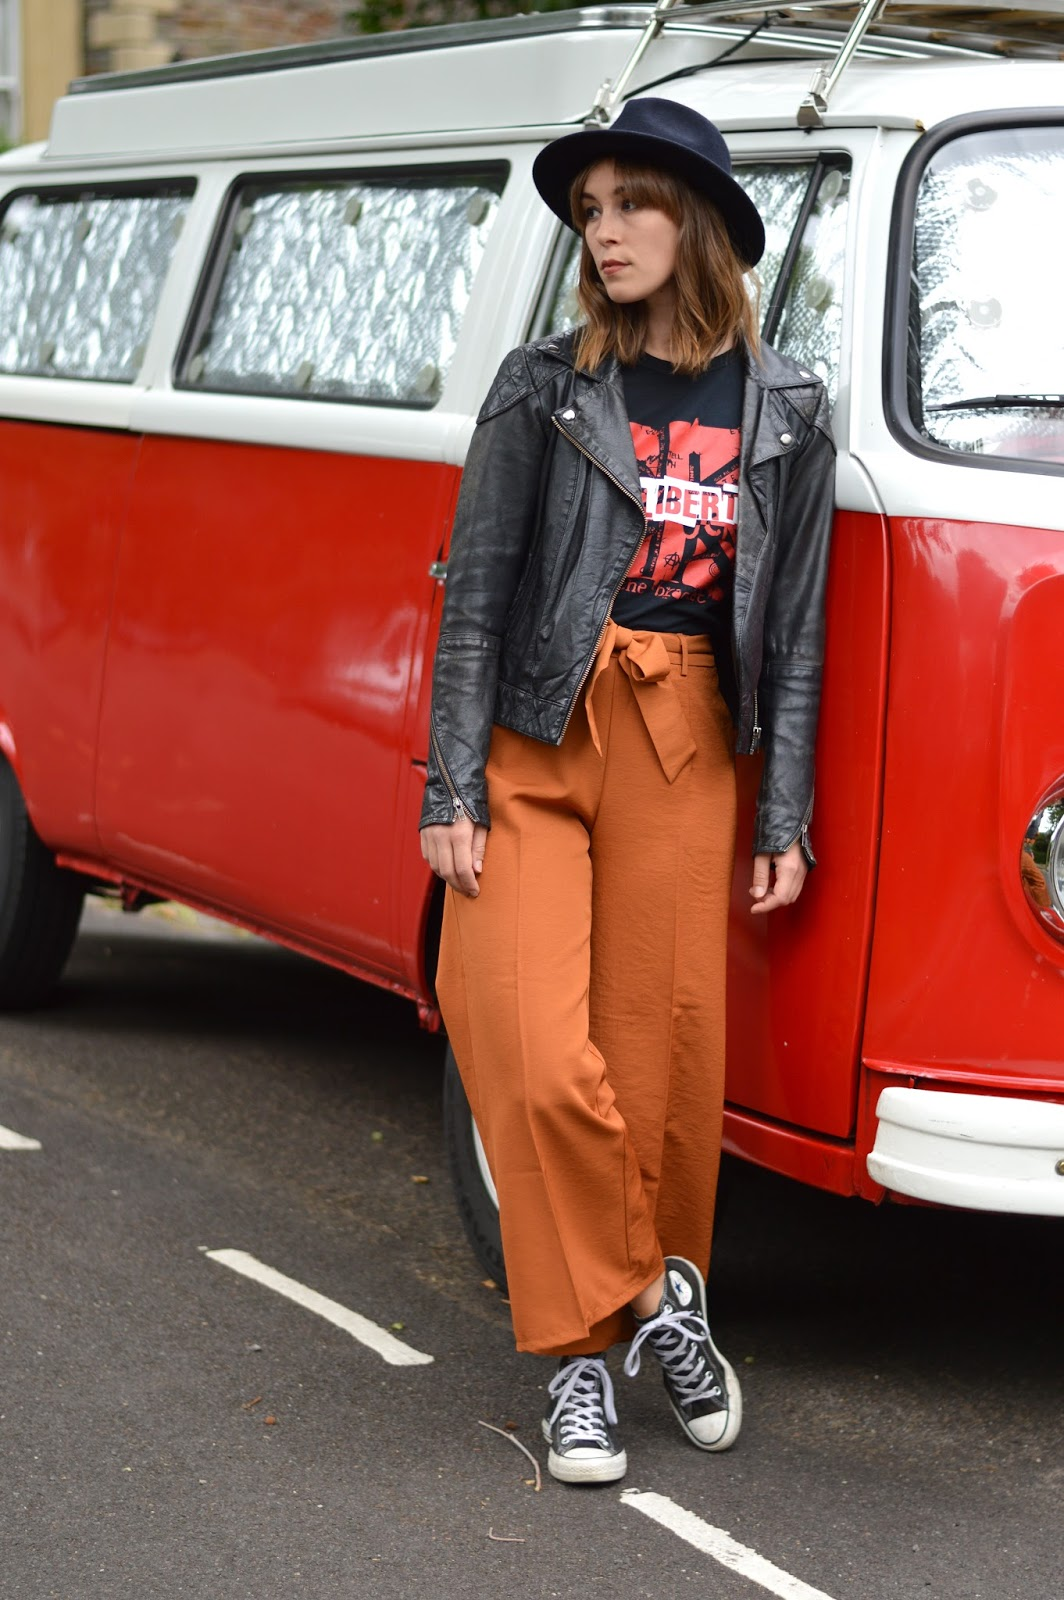 Band tee and orange culottes